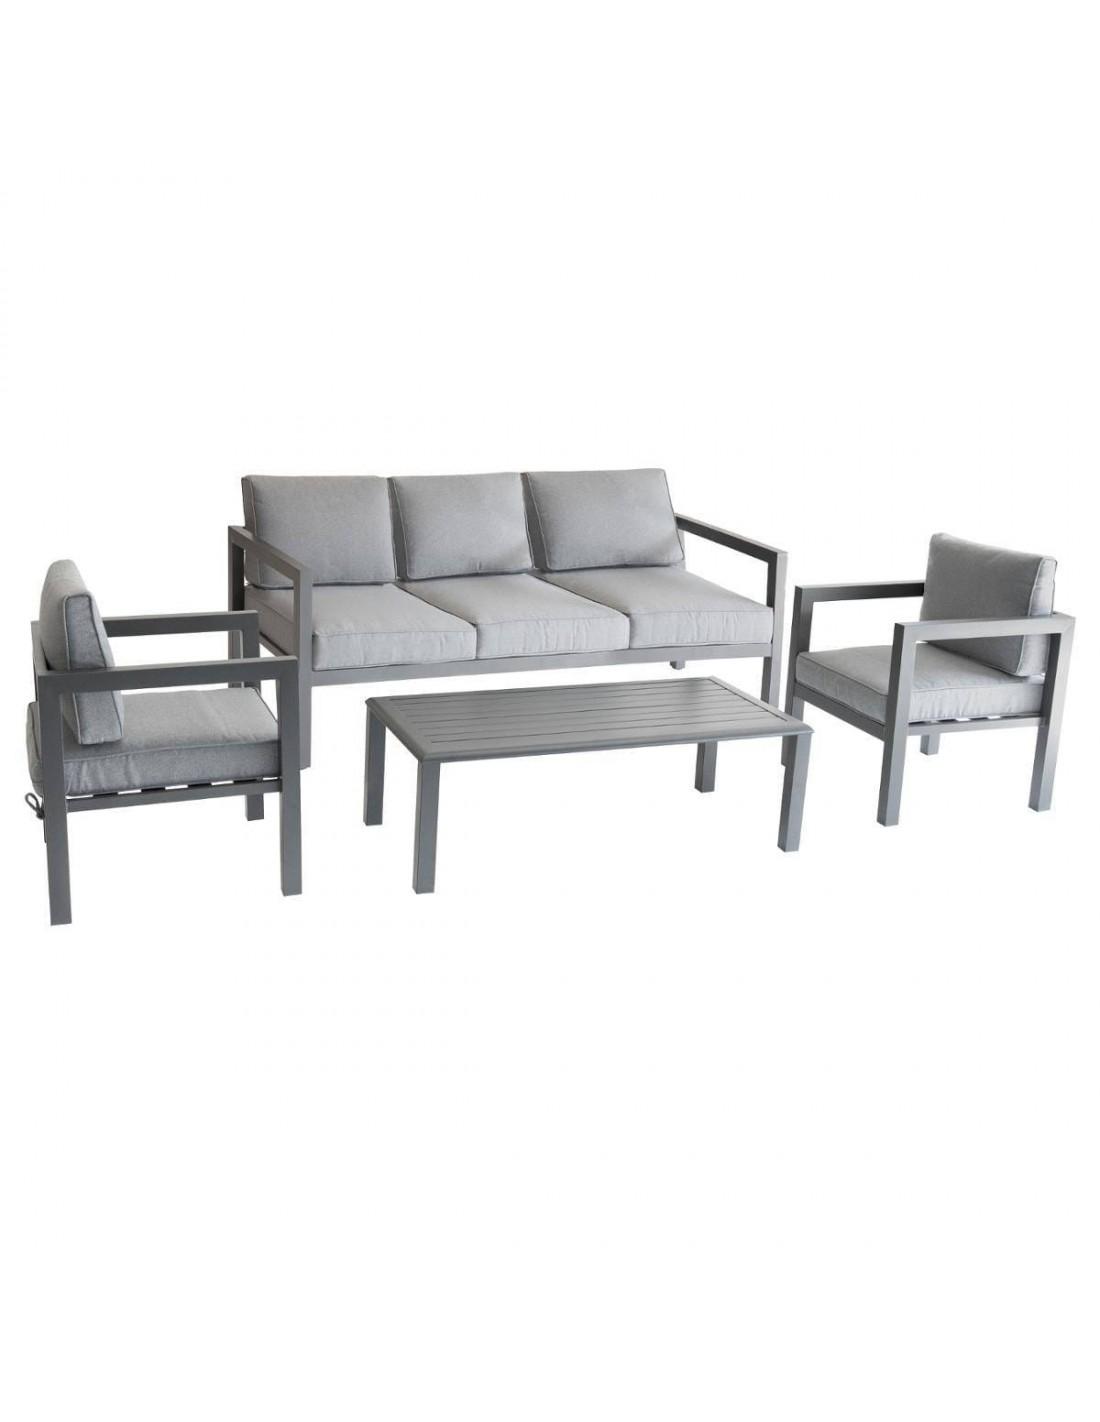 salon de jardin azua graphite 5 places aluminium. Black Bedroom Furniture Sets. Home Design Ideas